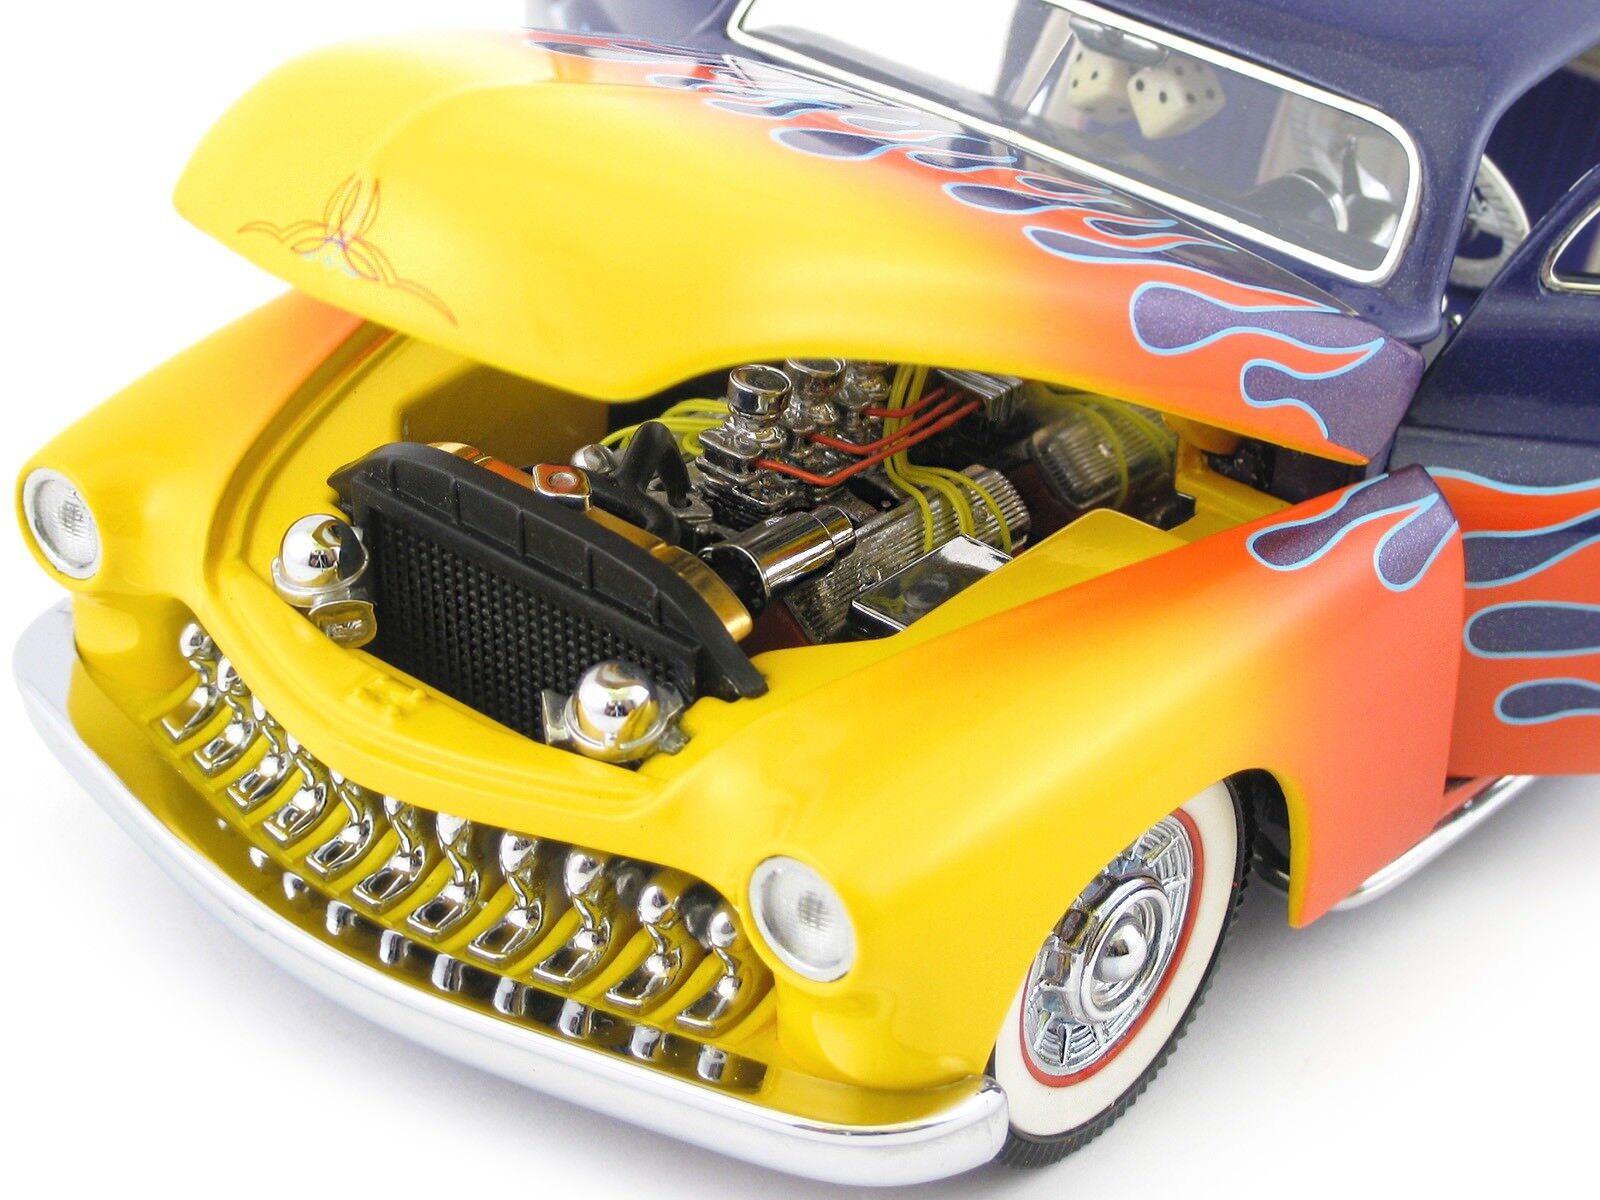 Hot Rod Ford Merc 1 Drag Race Car 1950 1951 1949 Vintage 24 18 12 Carousel Yello